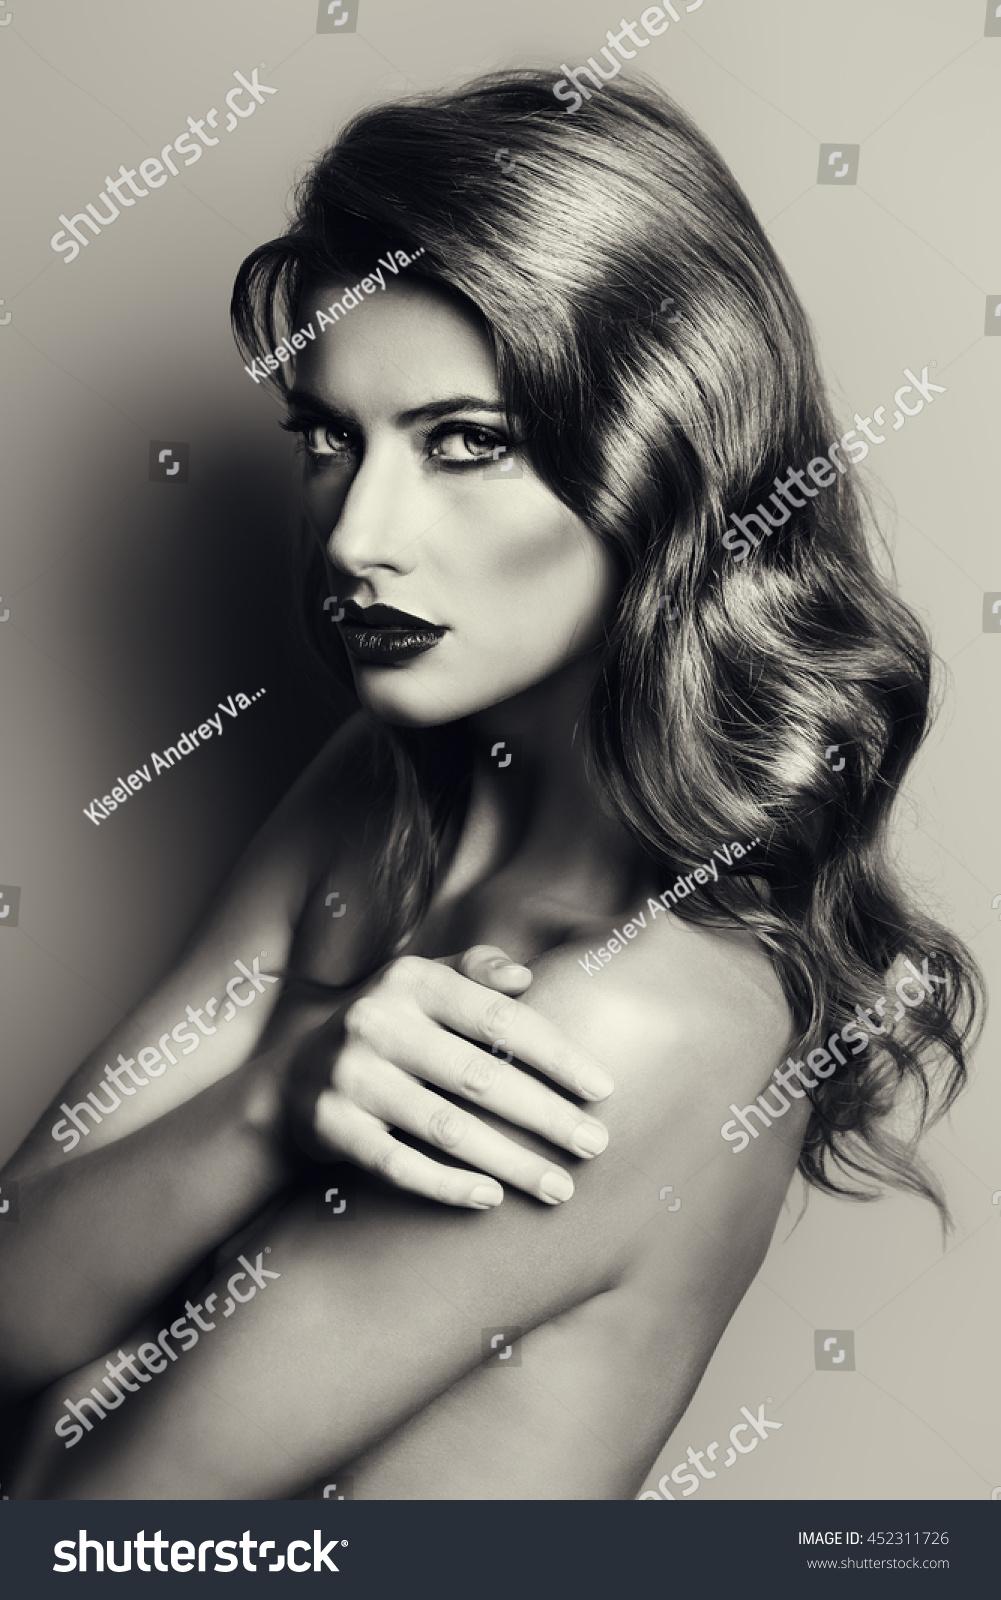 Blackandwhite portrait beautiful naked young woman stock